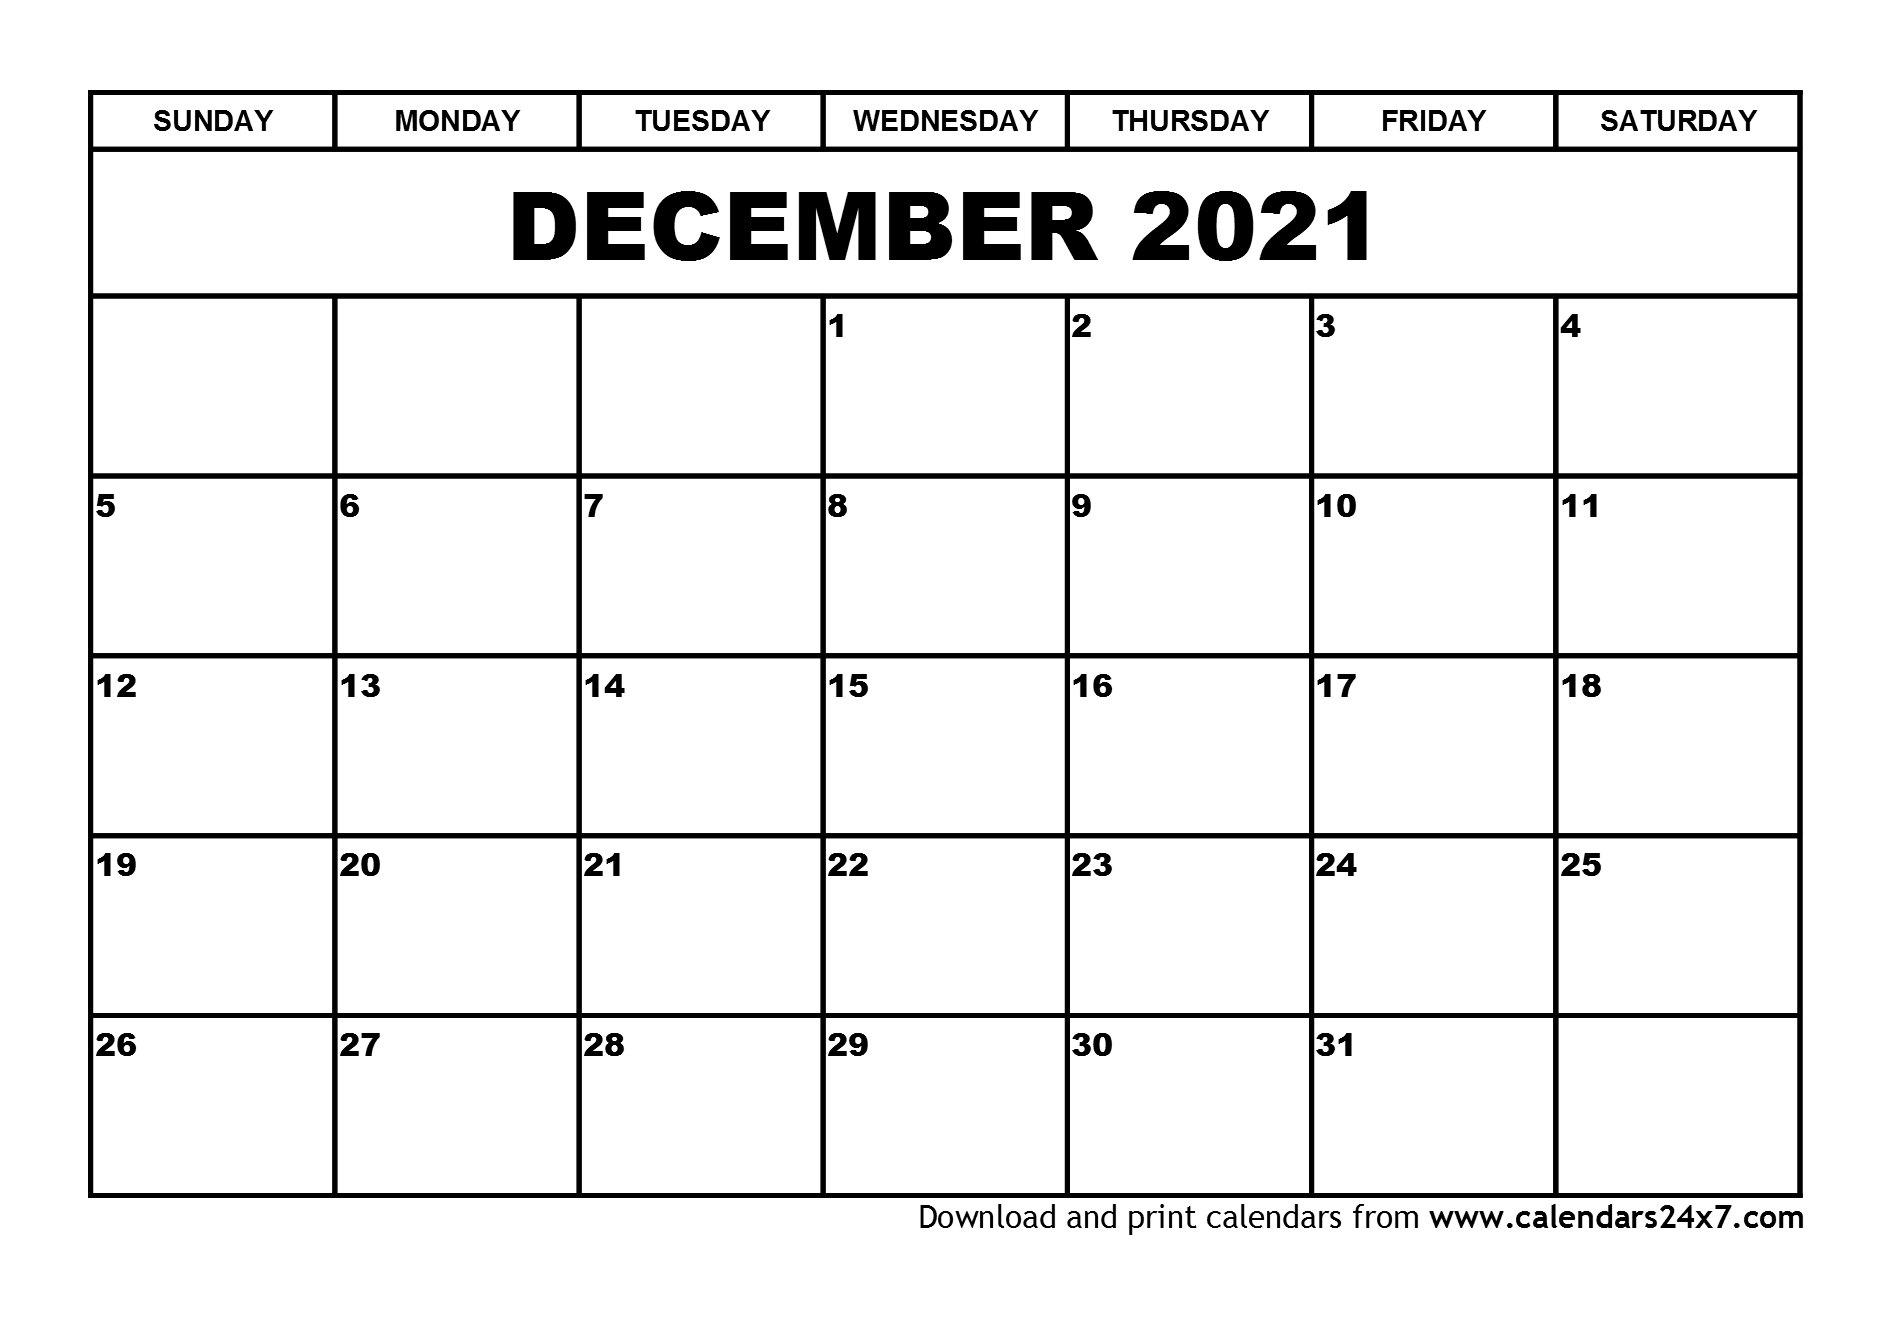 December 2021 Calendar & January 2022 Calendar